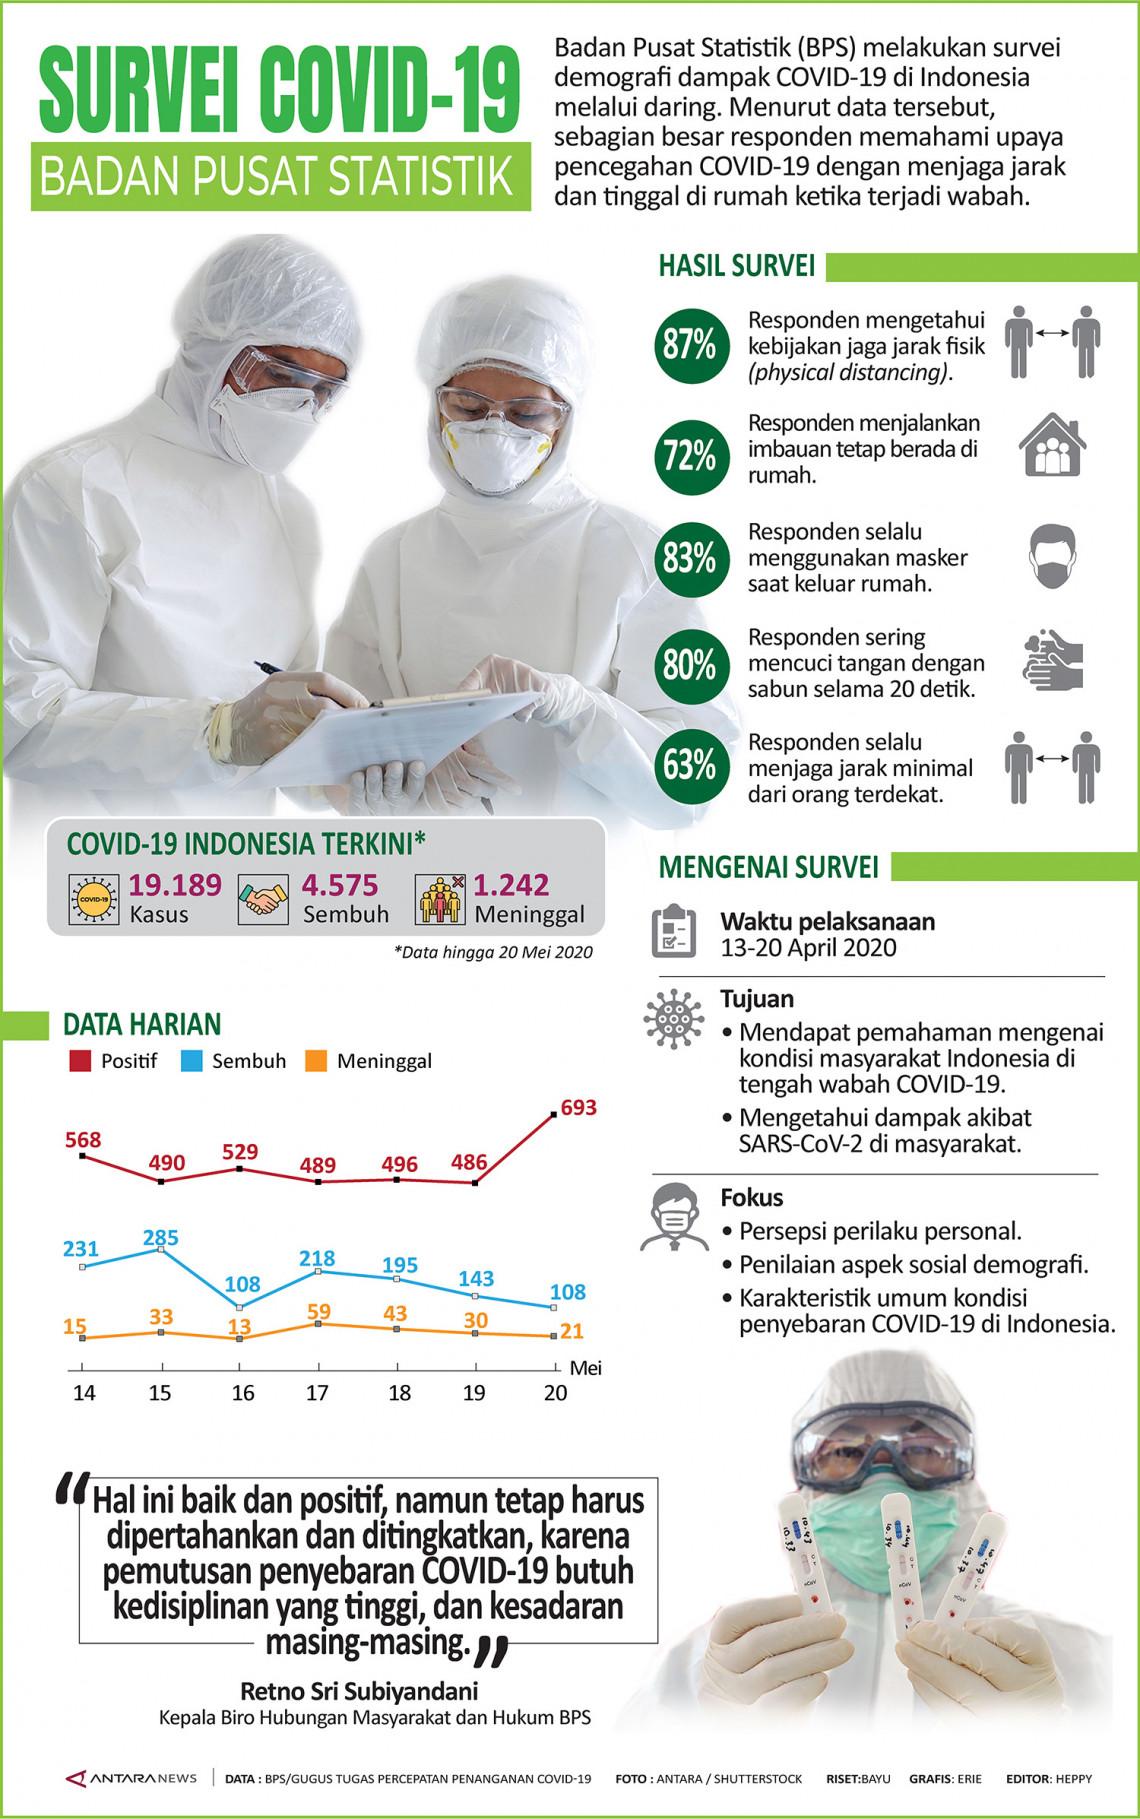 Survei COVID-19 Badan Pusat Statistik